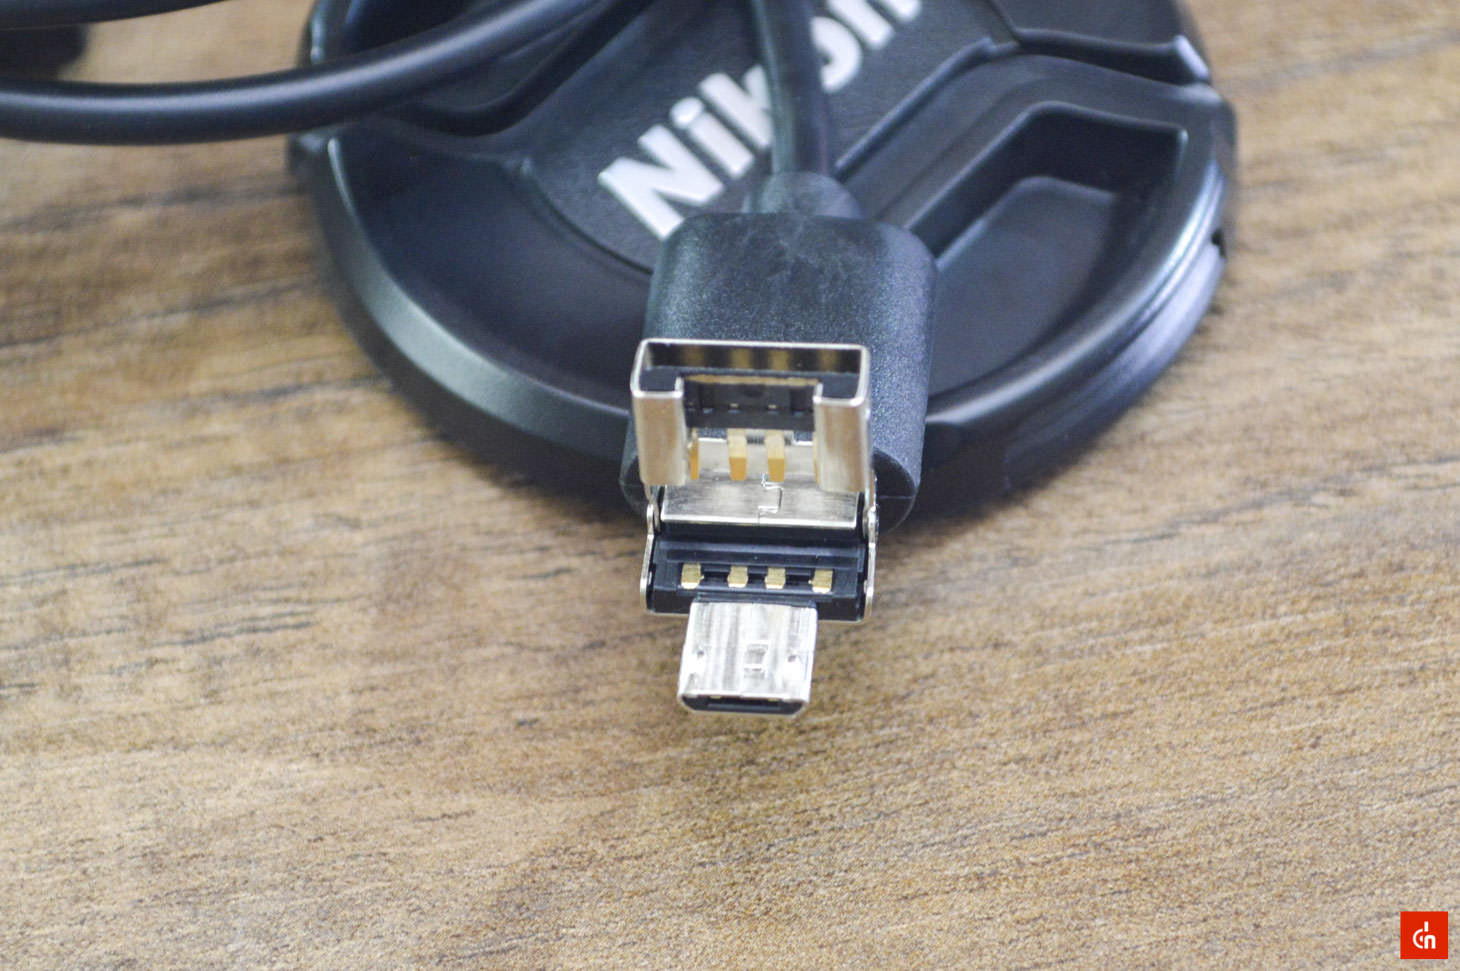 011_20160718_iegeek-u-multi-usb-cable